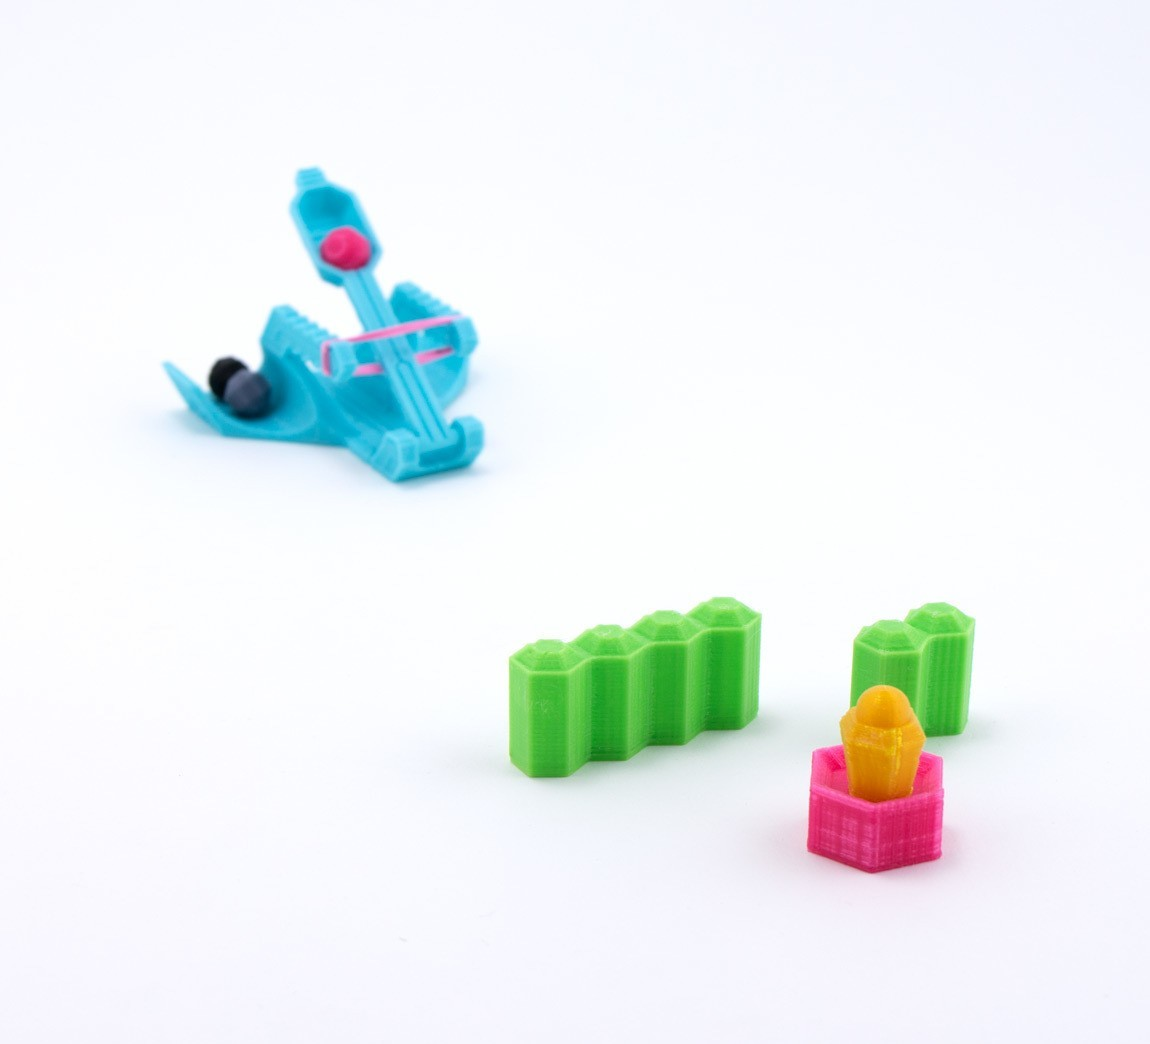 eff76c99dfcb90fbd191b859717f213b_1448060894788_NMD000202-14.jpg Download free STL file Catapult Defense • 3D print model, FerryTeacher